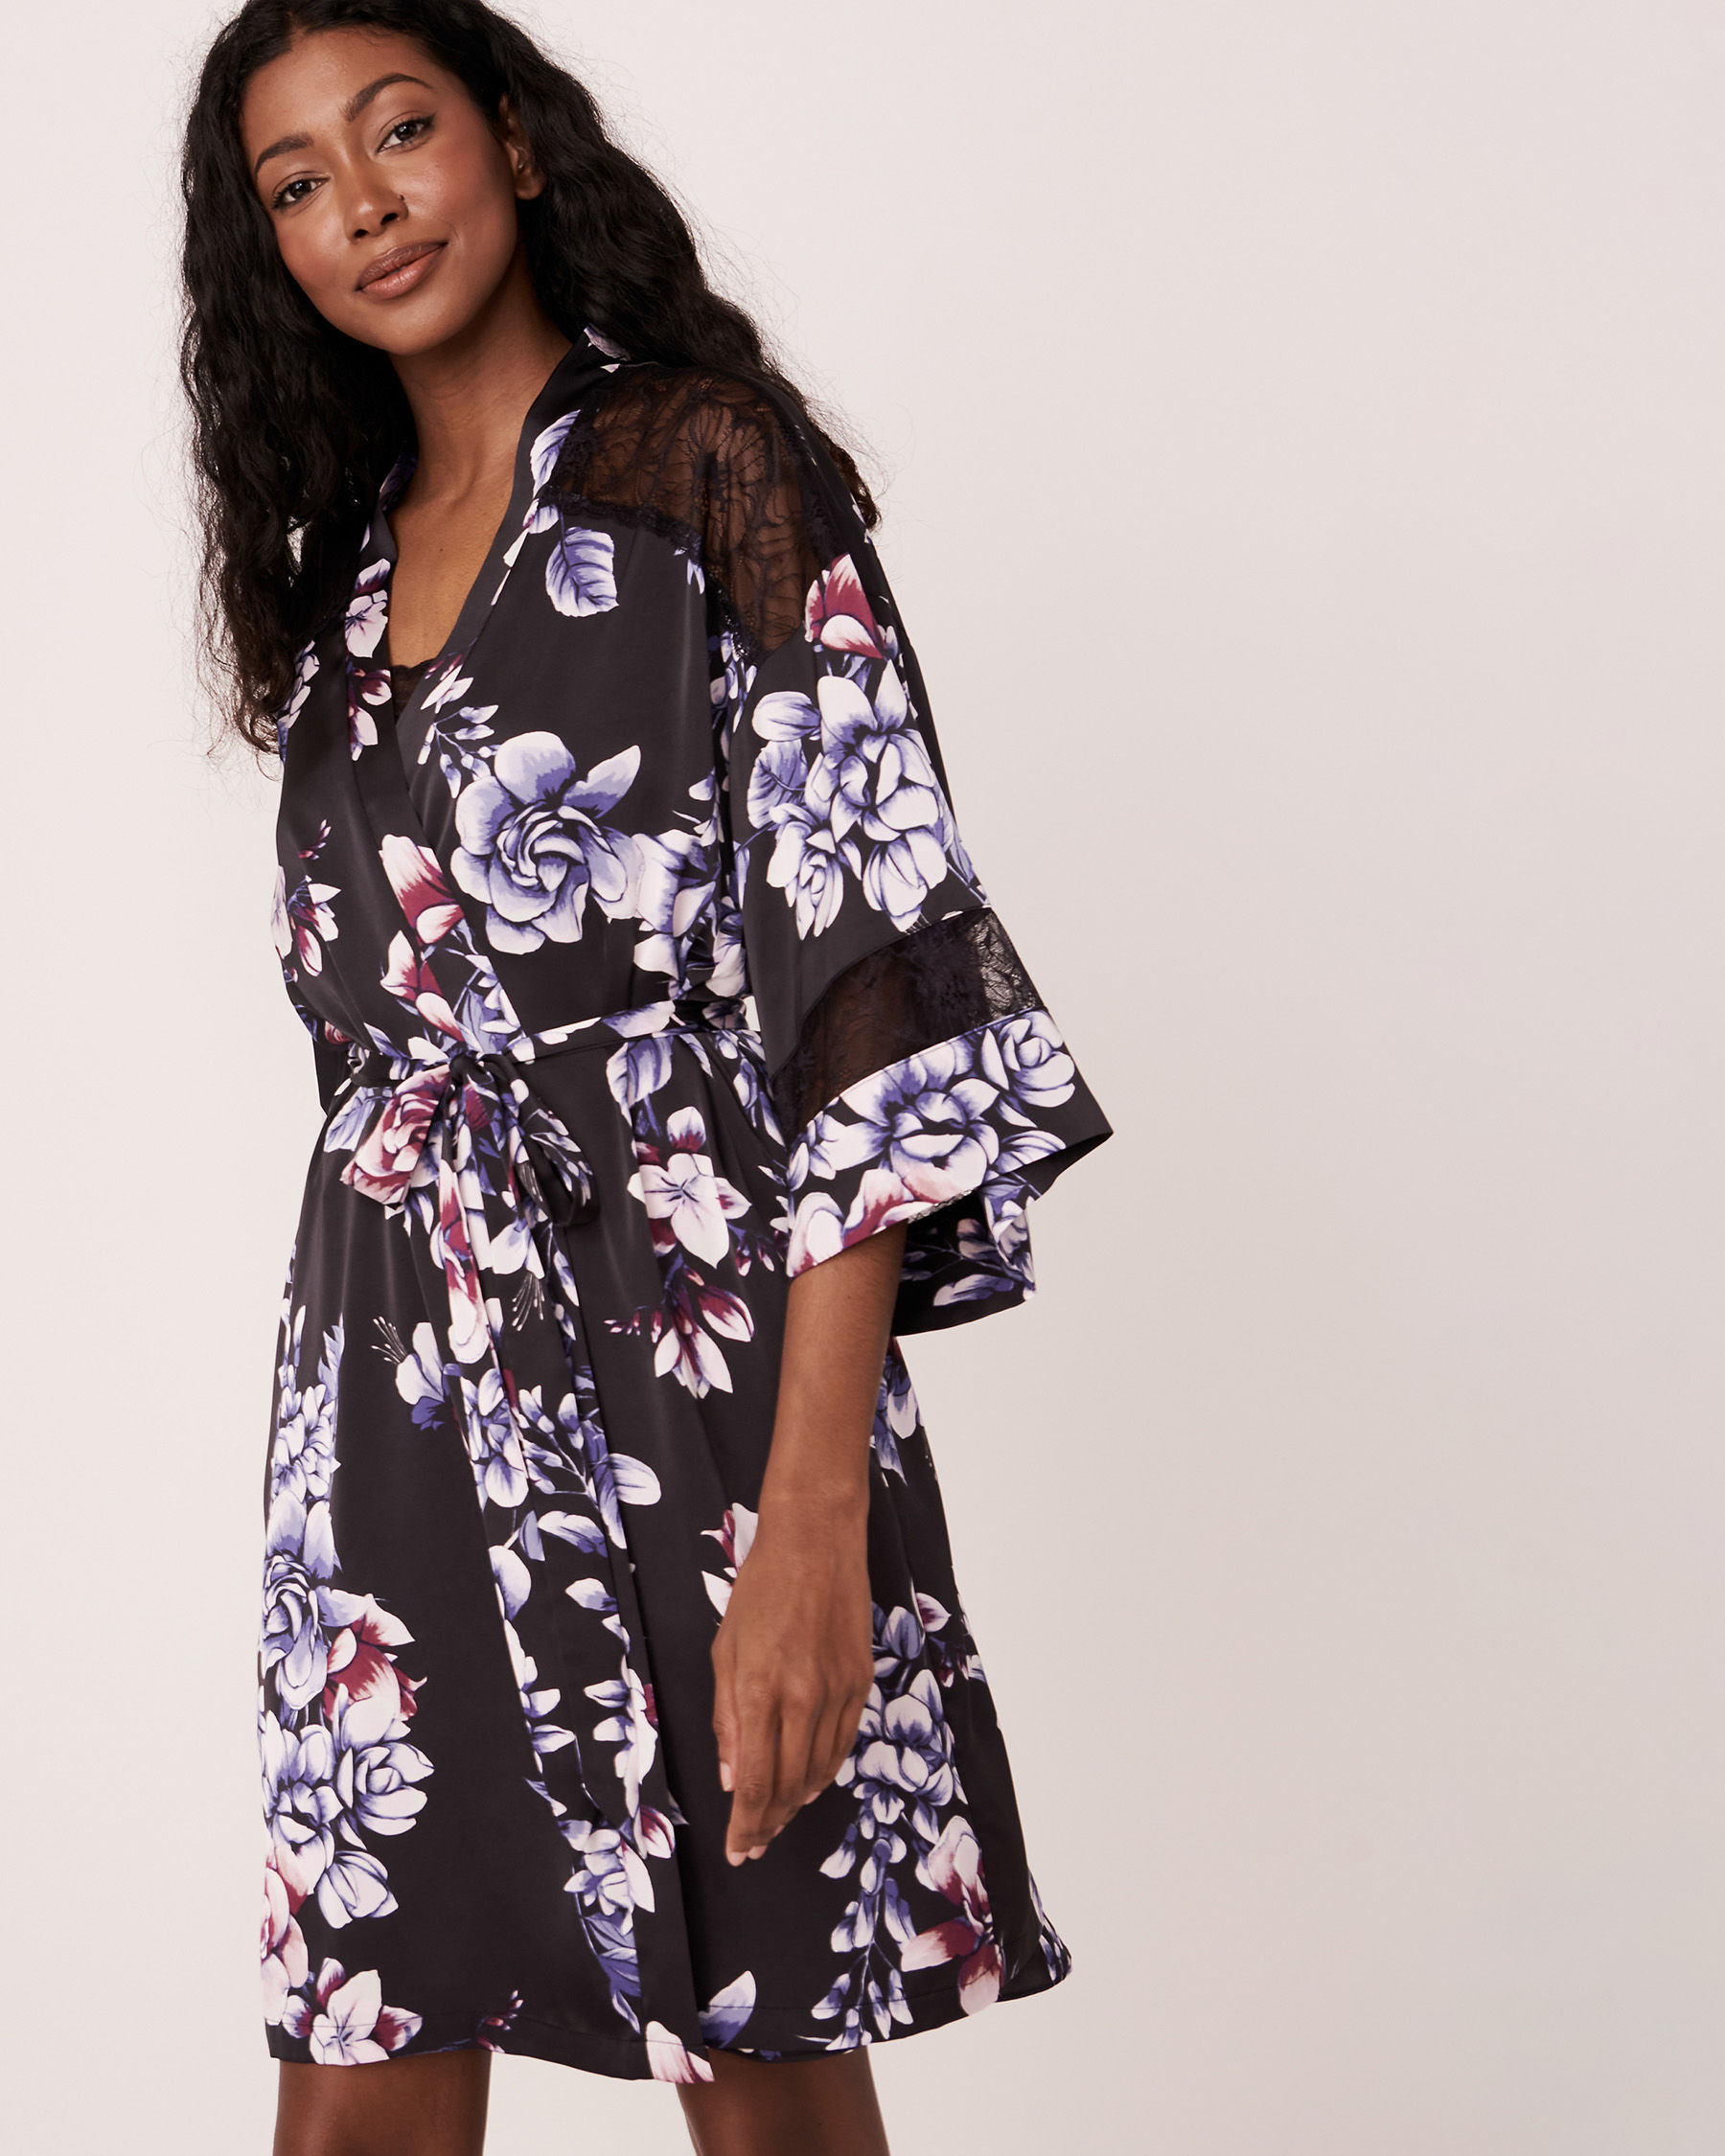 LA VIE EN ROSE Kimono en satin garniture de dentelle Fleurs aquarelles 60600007 - Voir2